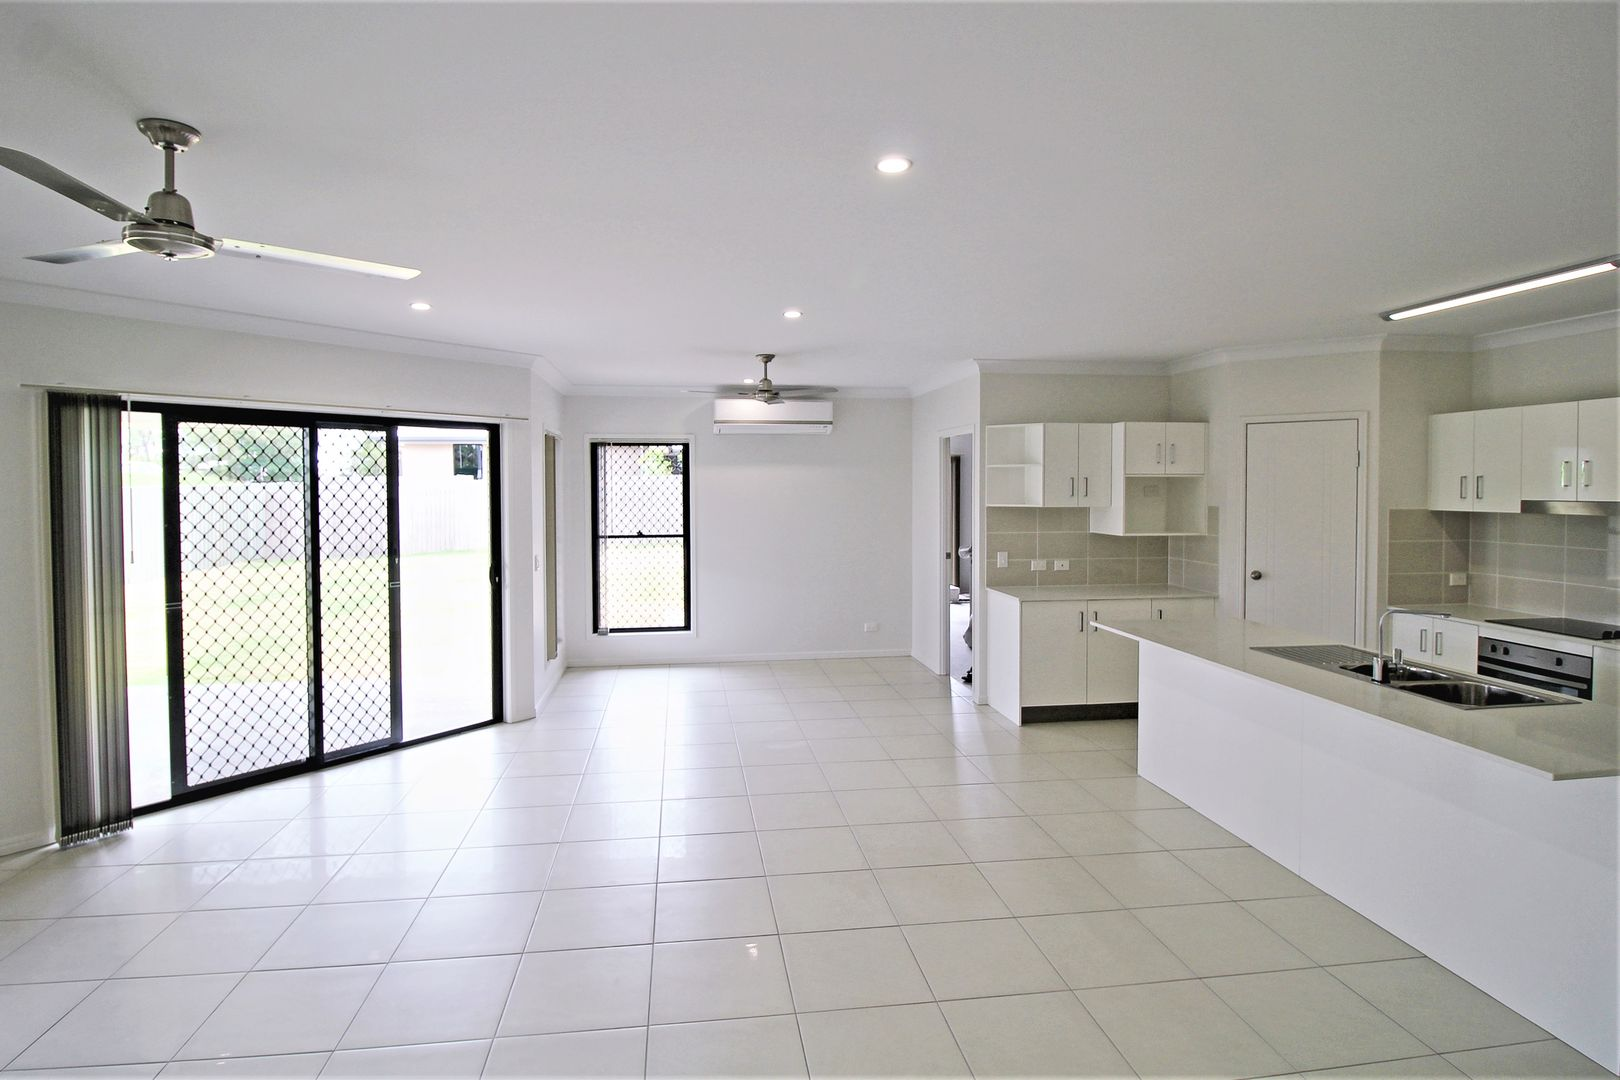 Lot 2 Longford Court, Parkhurst QLD 4702, Image 2